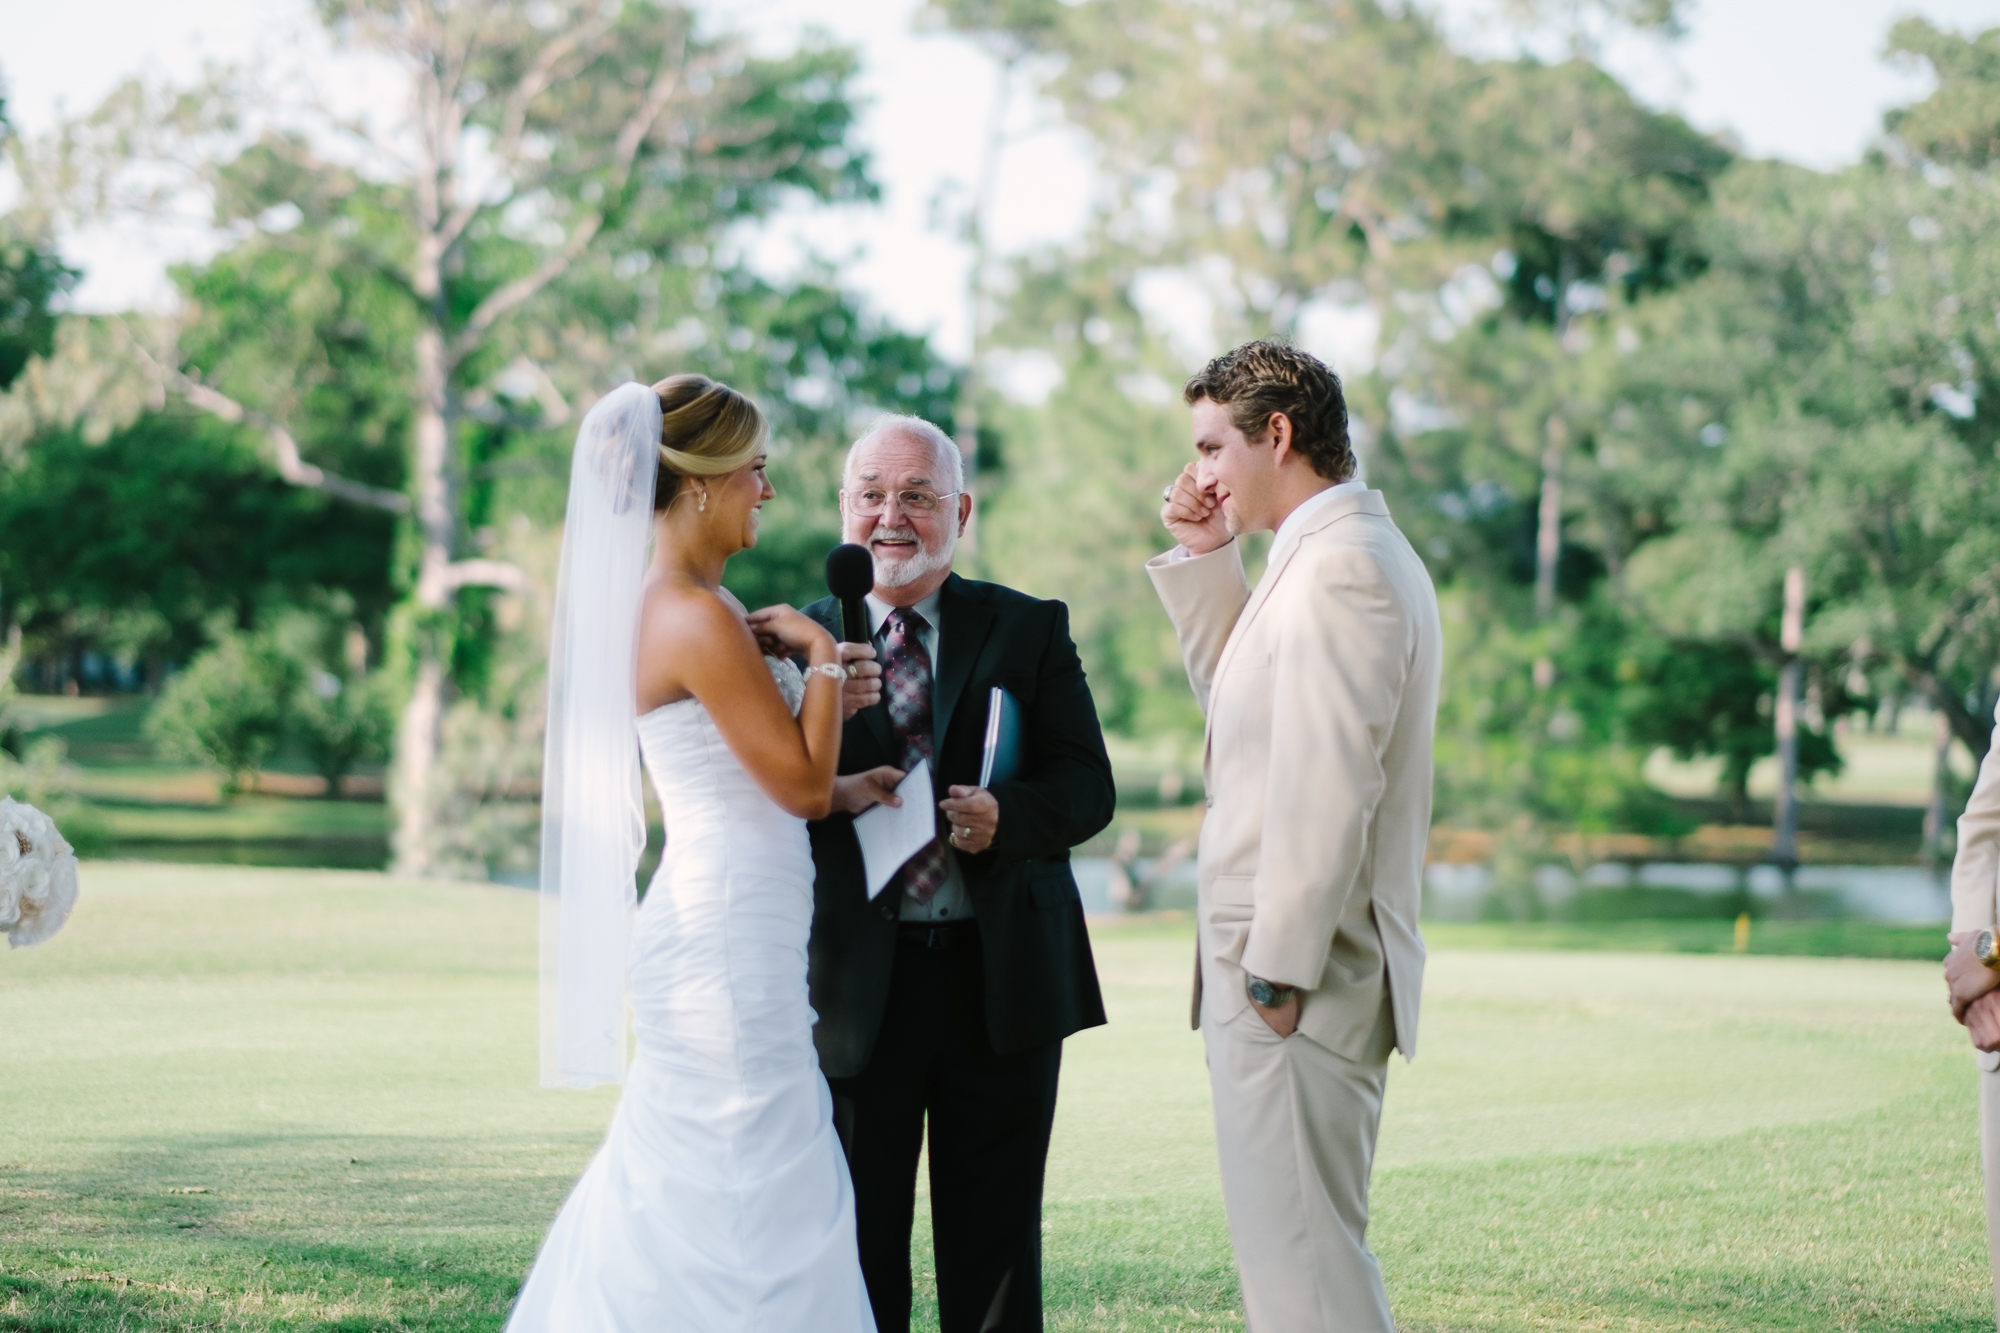 Heather-Chris-wedding-blog-19.jpg